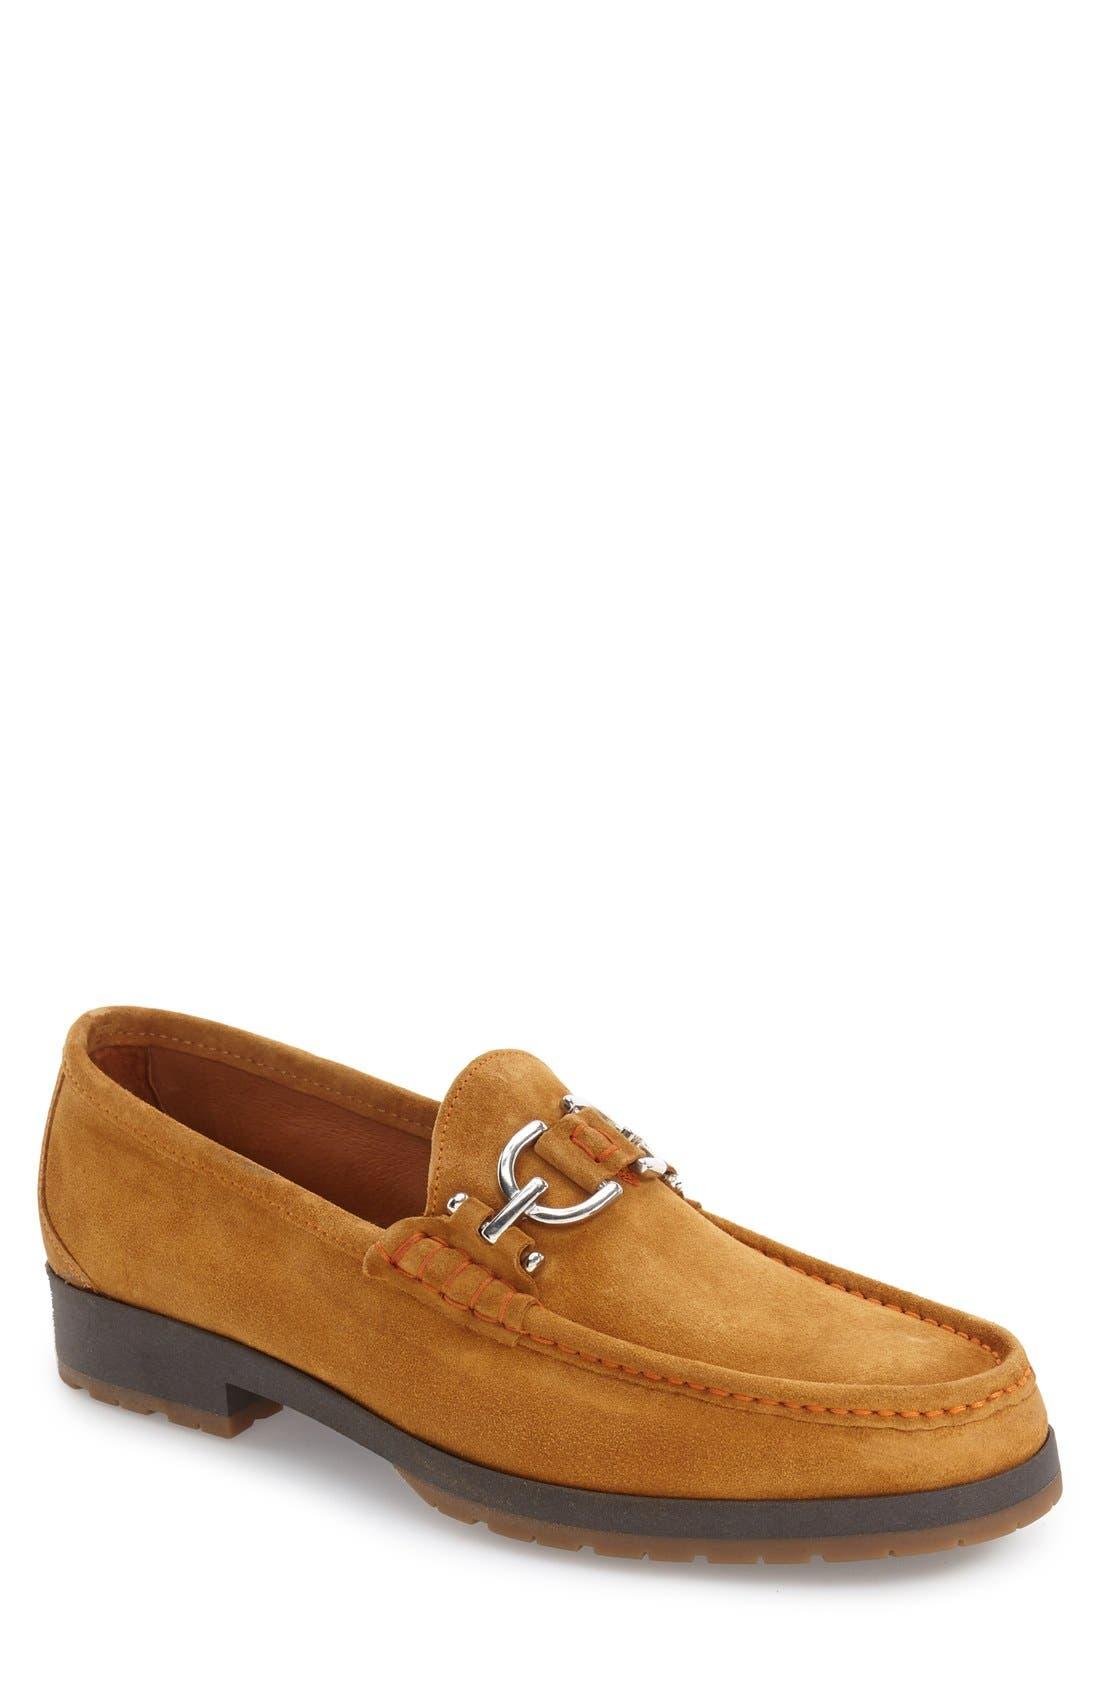 Lelio Bit Loafer,                             Main thumbnail 1, color,                             Saddle Suede